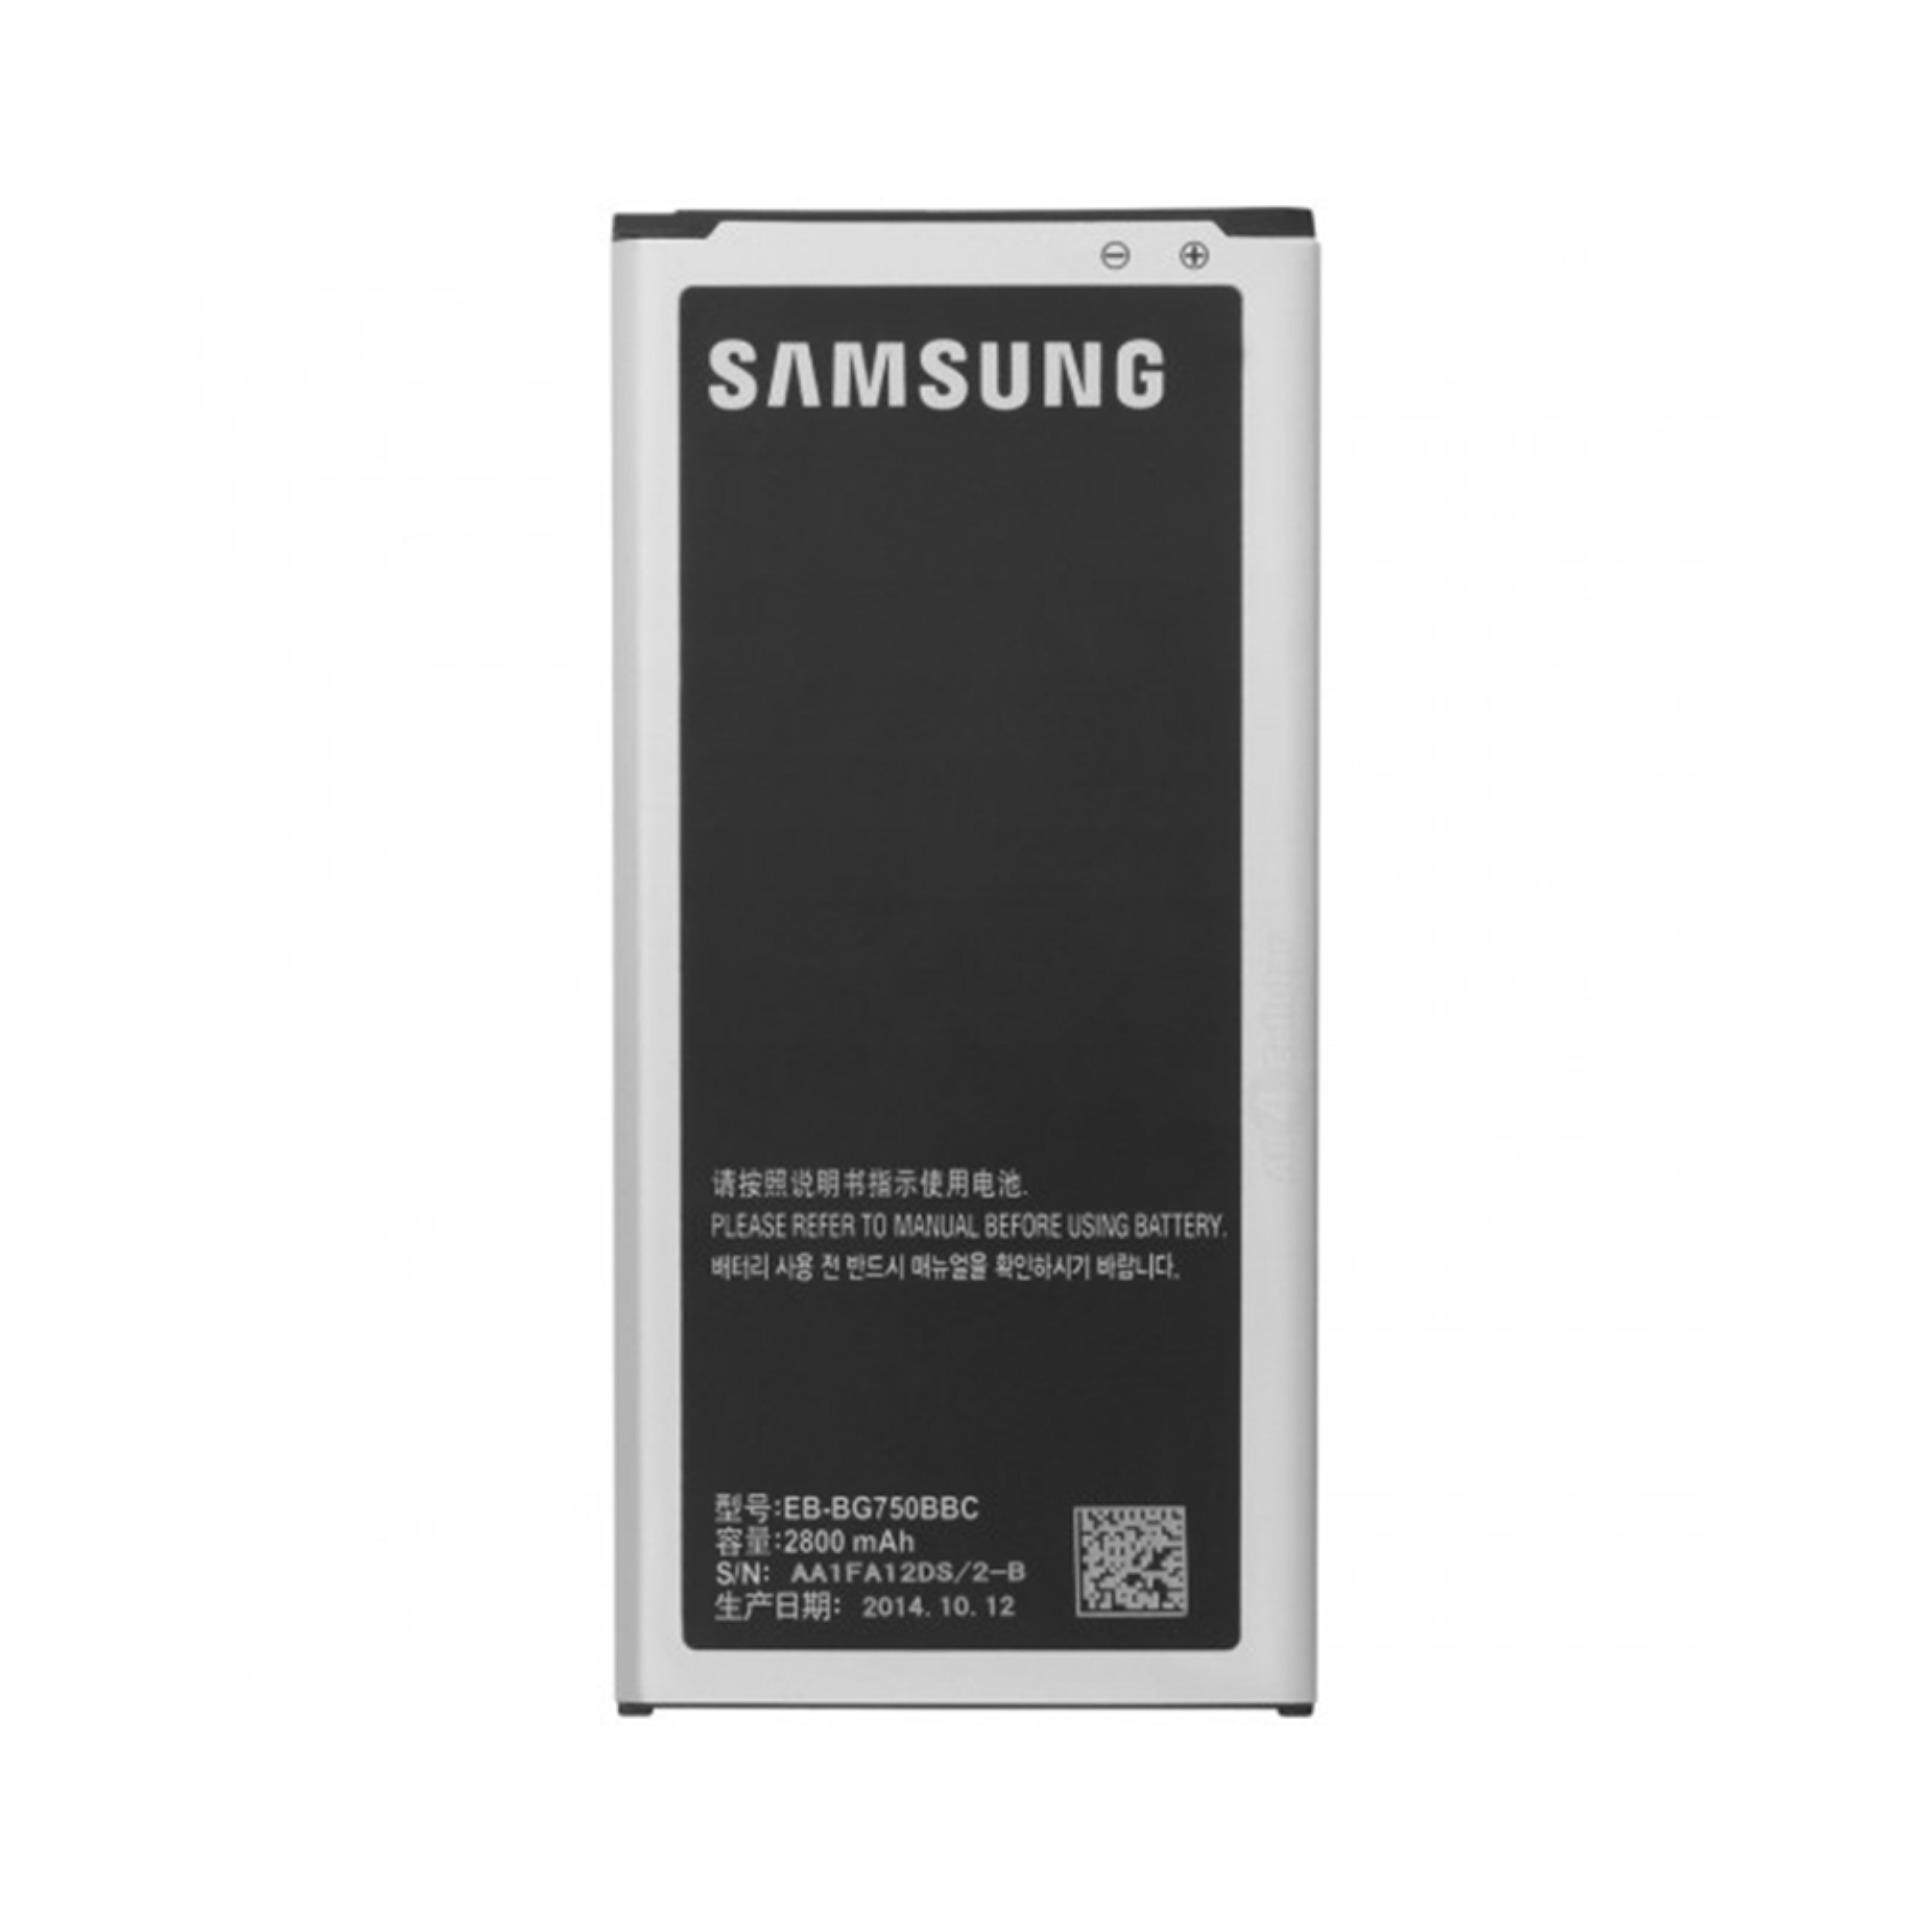 [ORIGINAL] SAMSUNG Galaxy Mega 2 Battery 2800mAh [G7508]